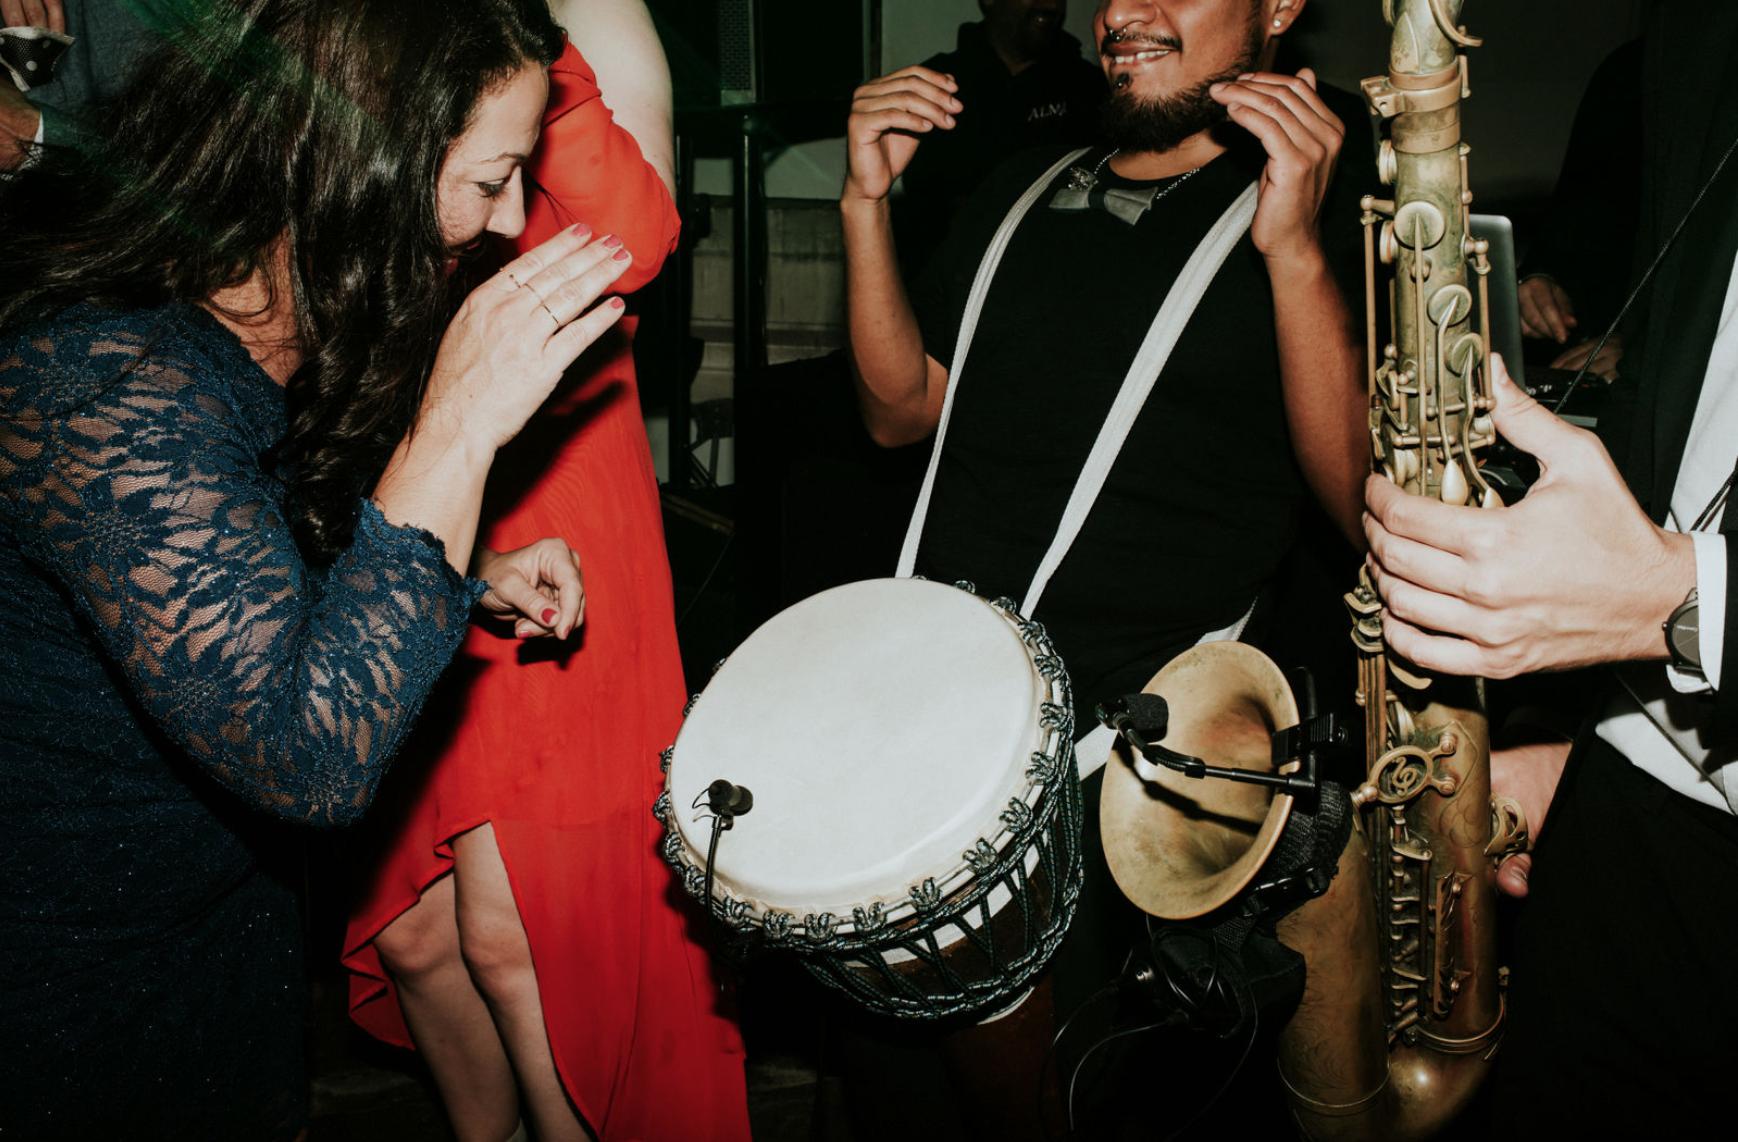 wedding-band-italy.png